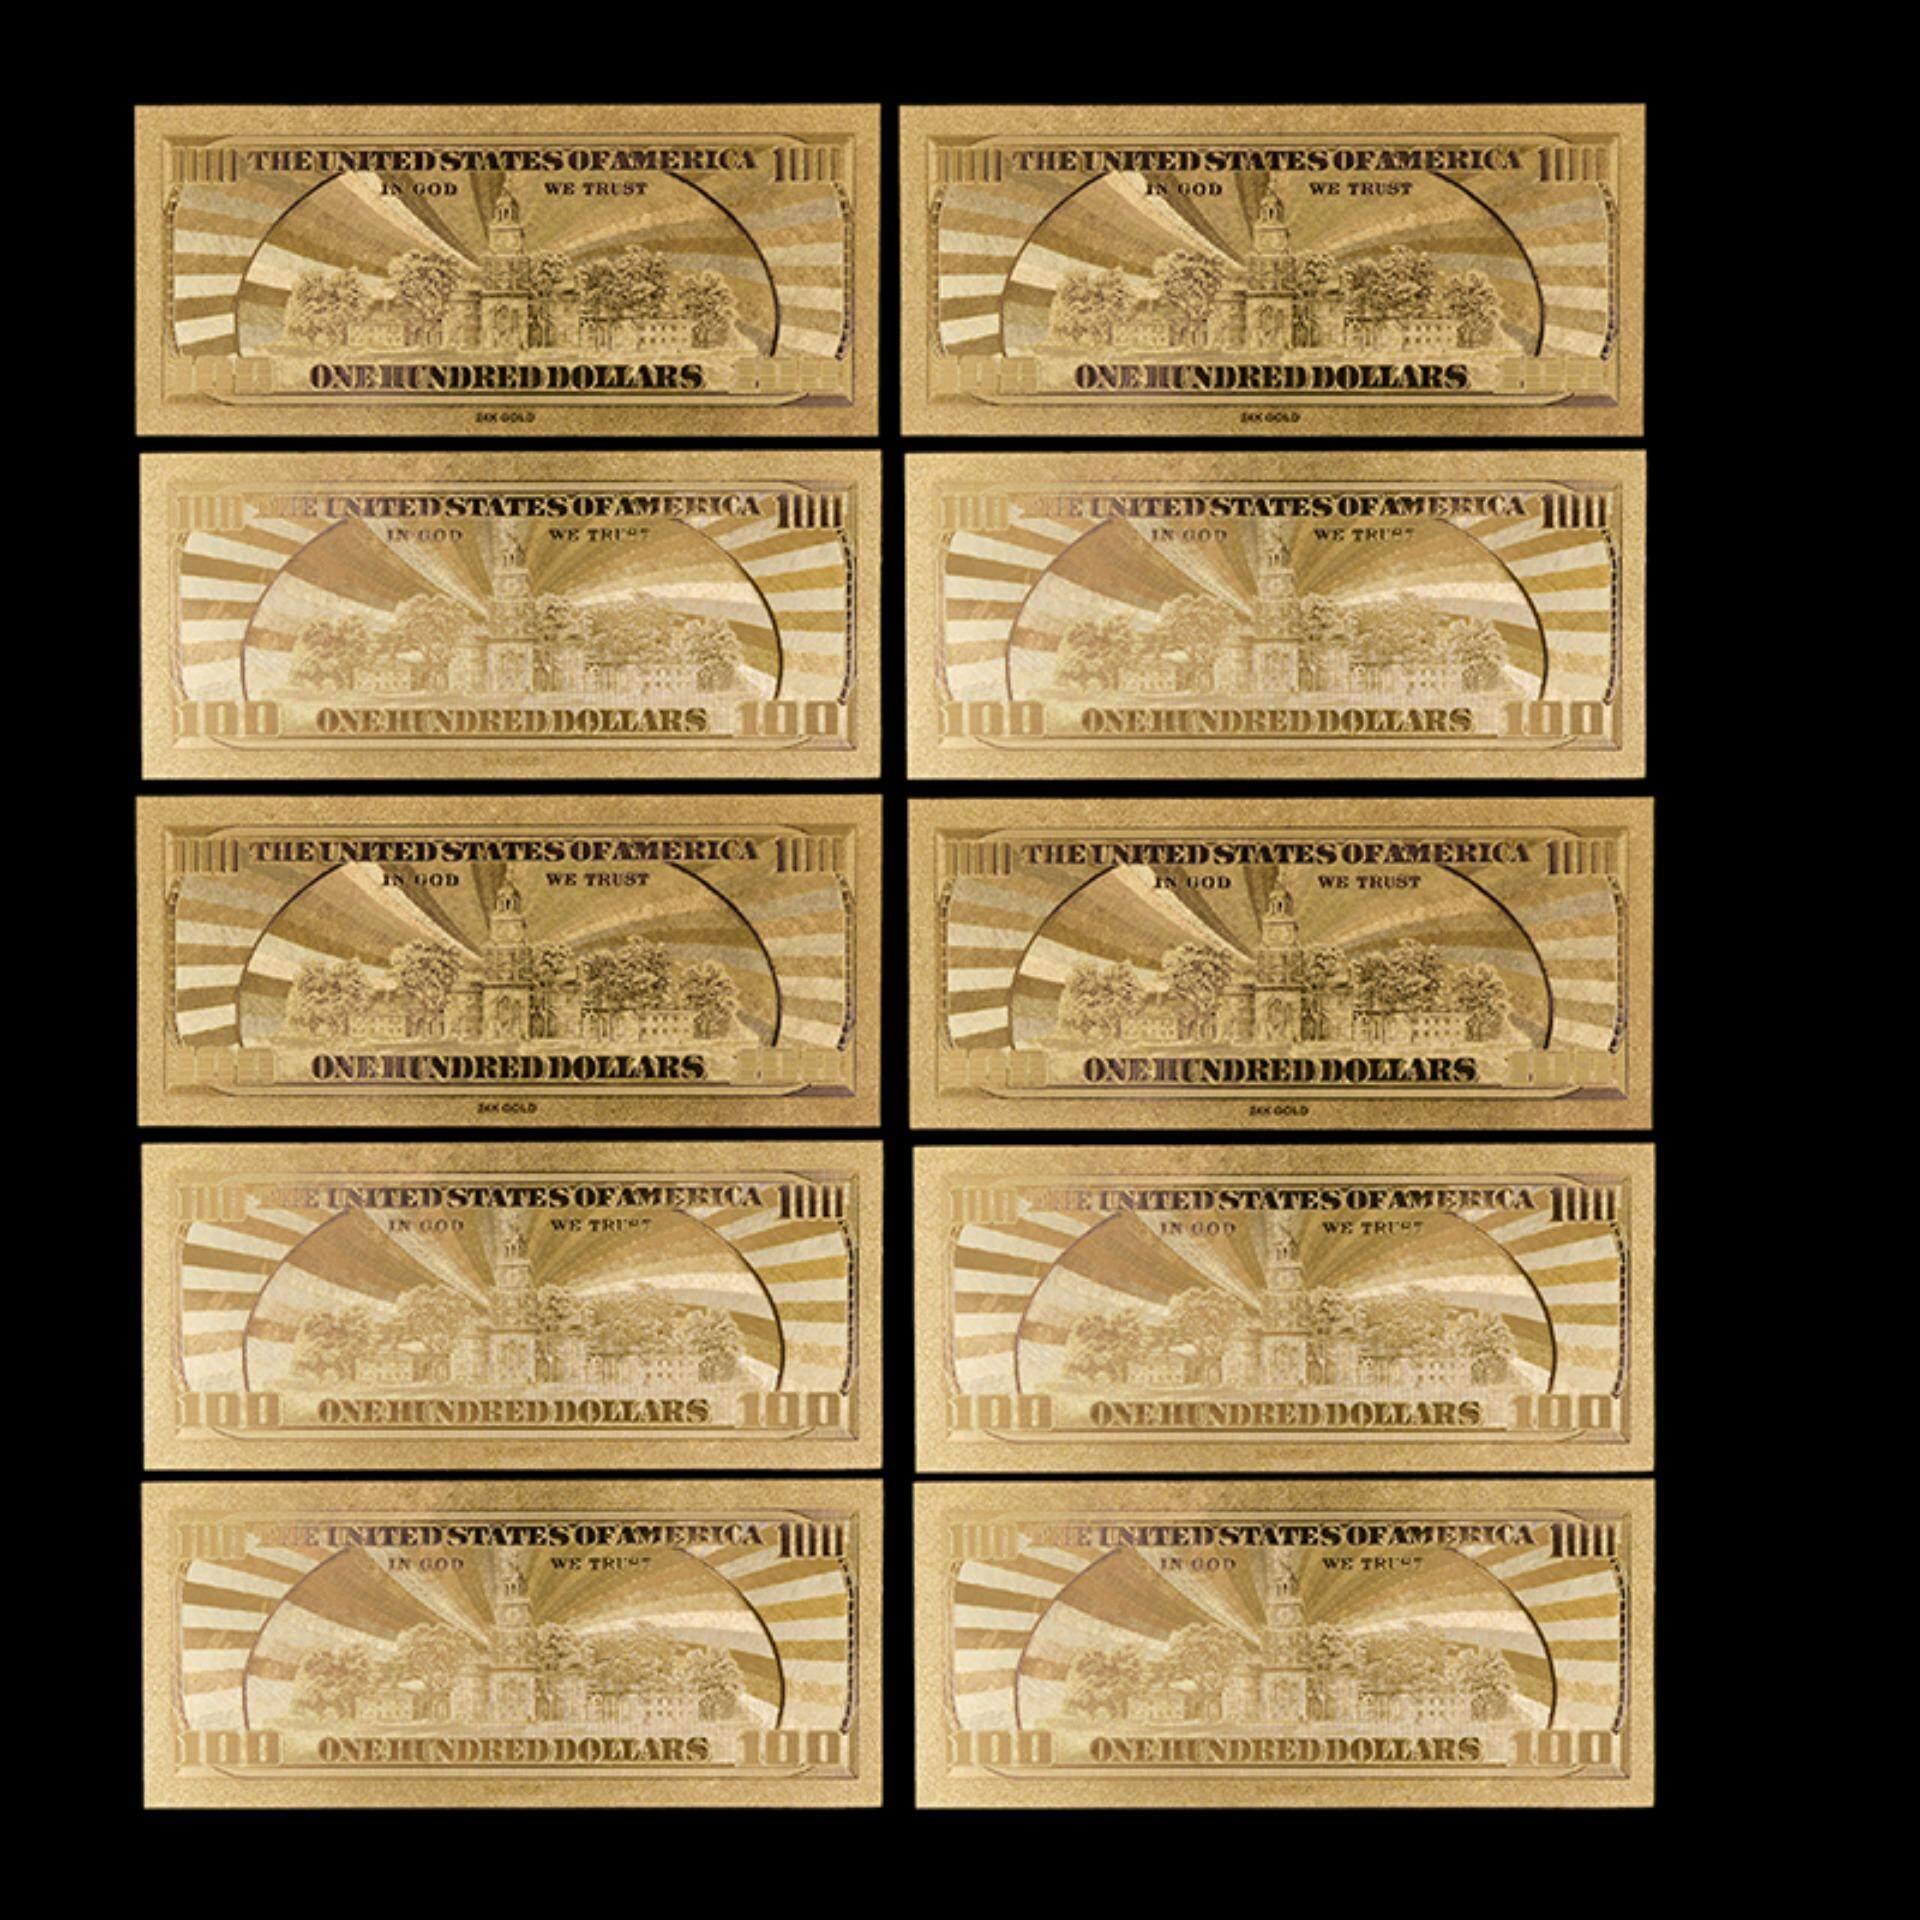 Jettingbuy 10pcs Us$100 Dollar 24k Gold Foil Golden Usd Paper Money  Banknotes Collections